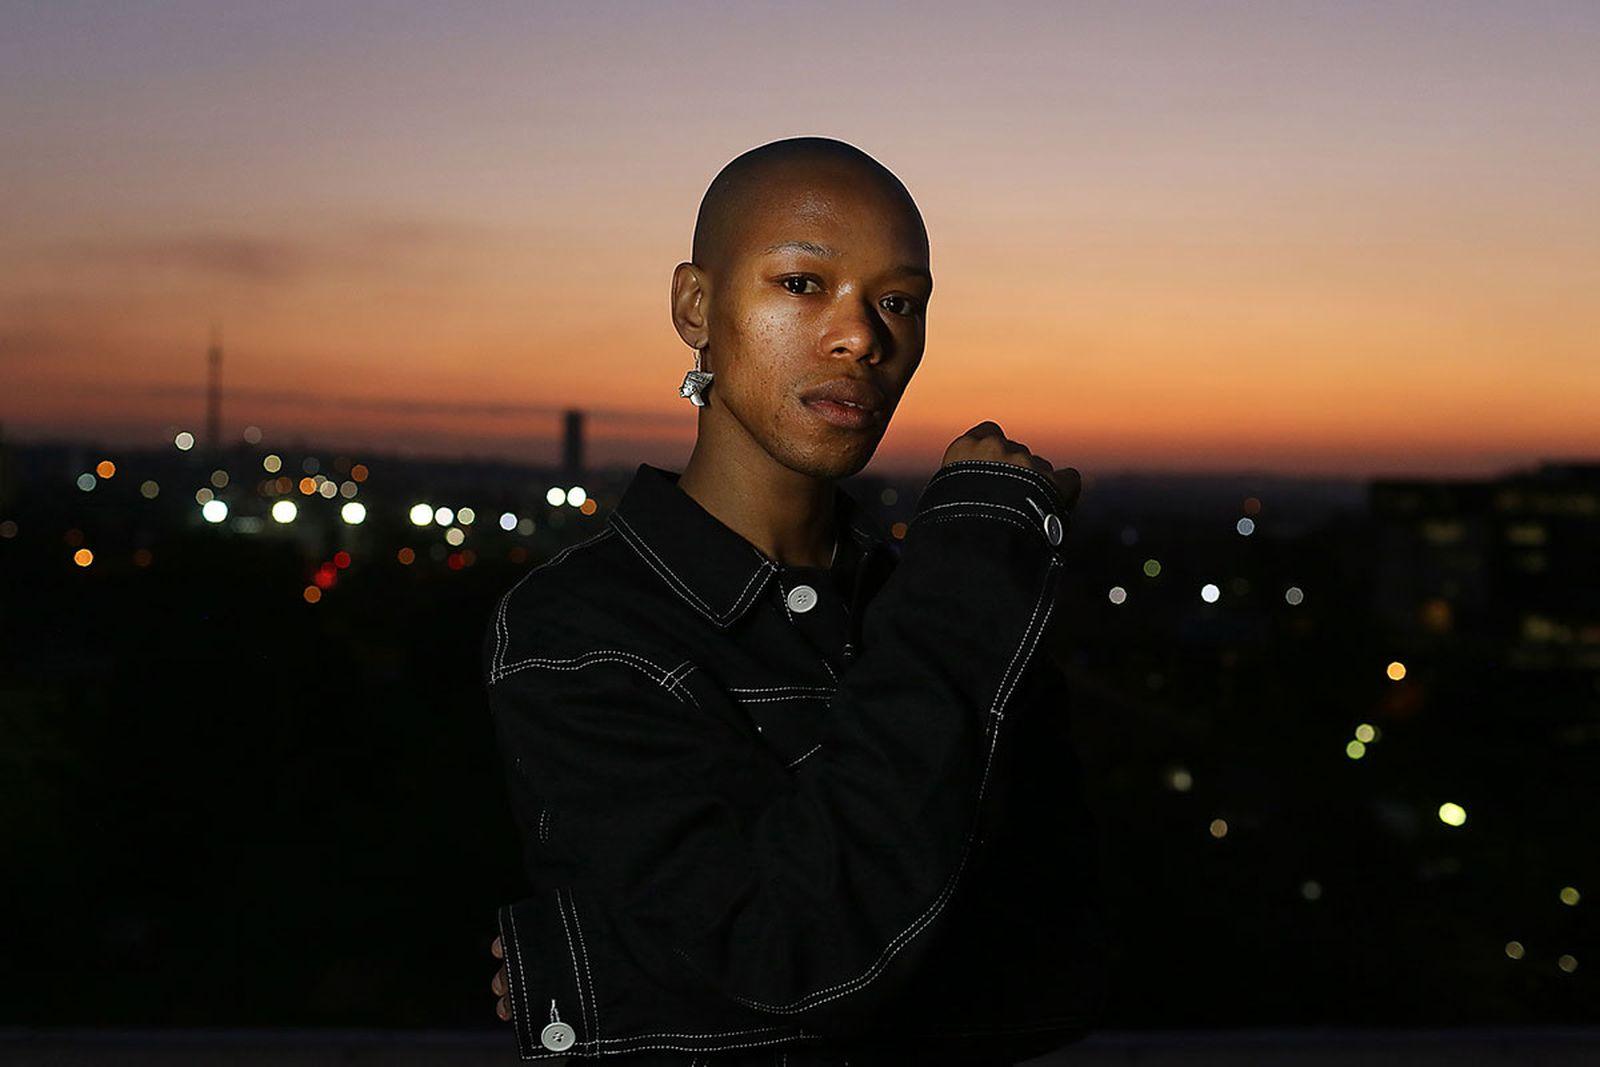 best south african artists AKA DJ Maphorisa Dee Koala